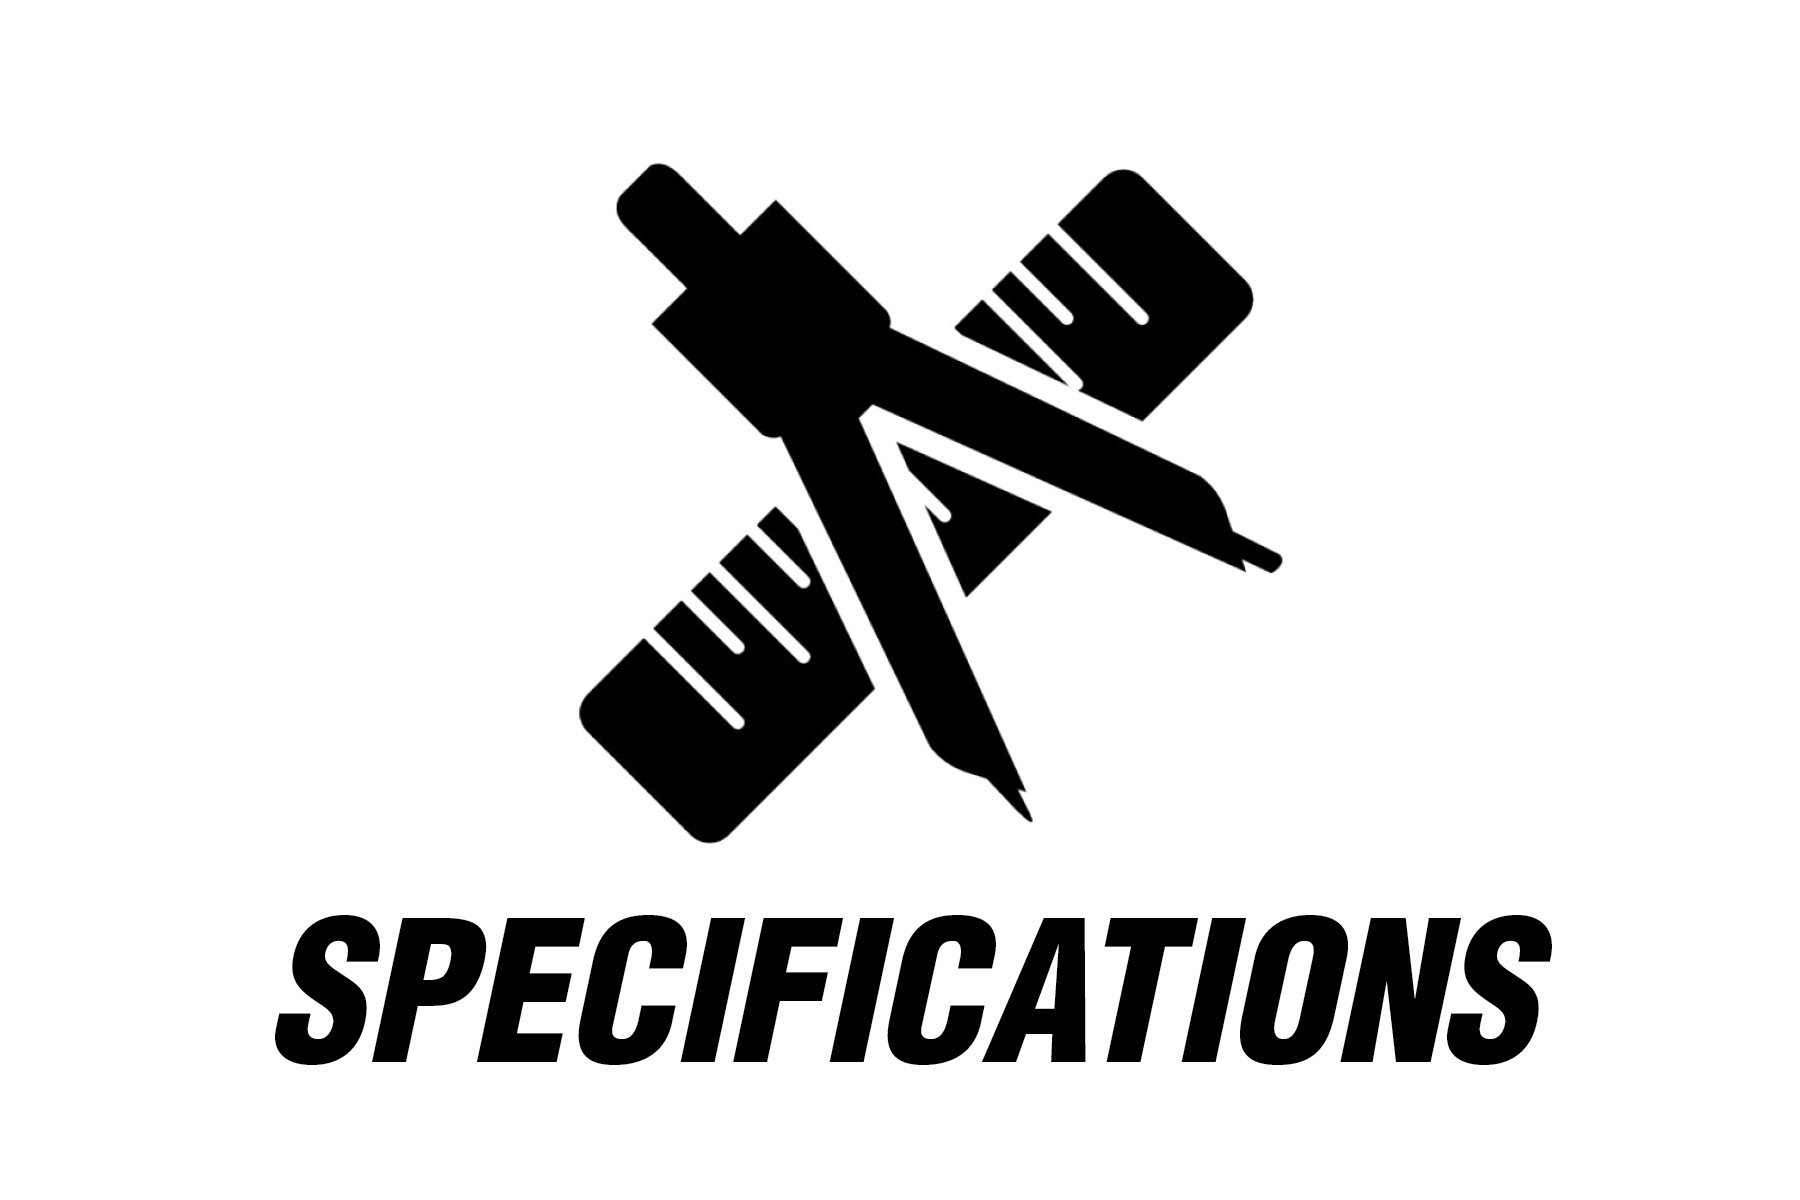 10-12 BBI MagnaSpread Specifications